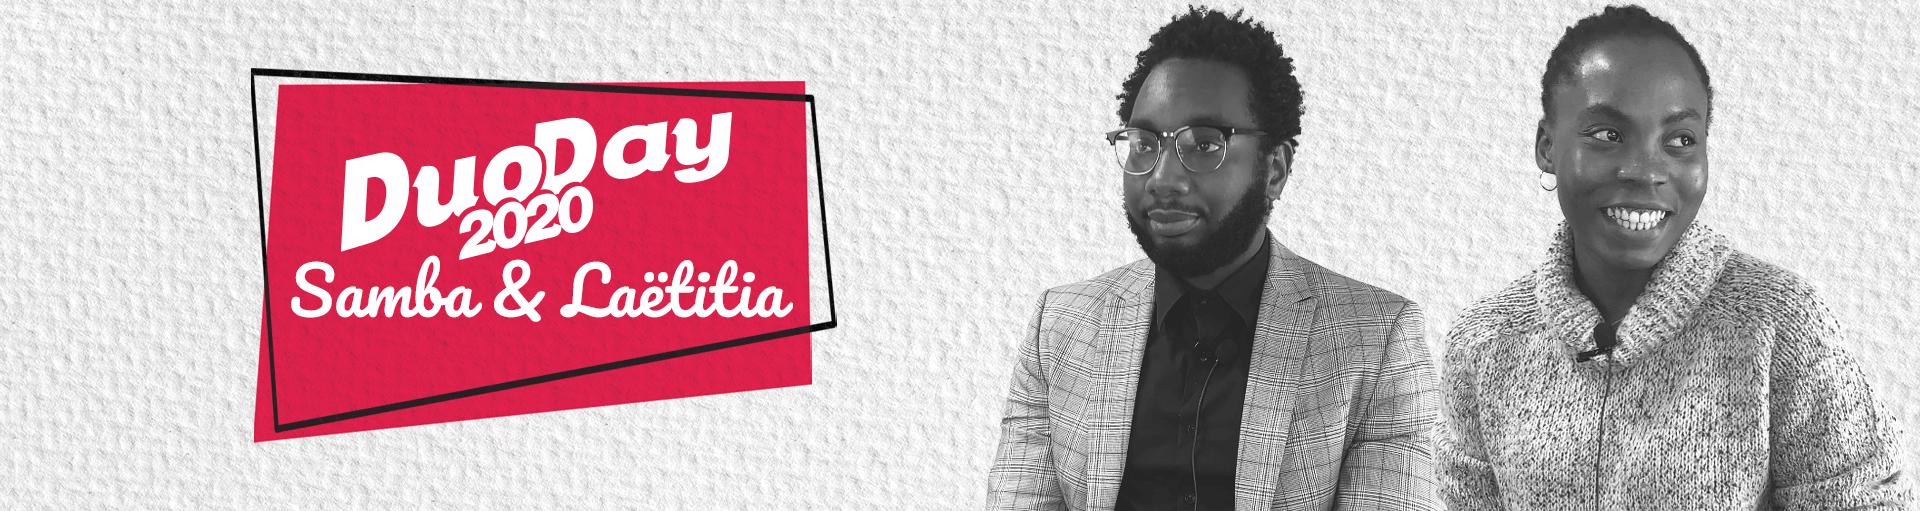 DuoDay-2020-Samba-et-Laetitia